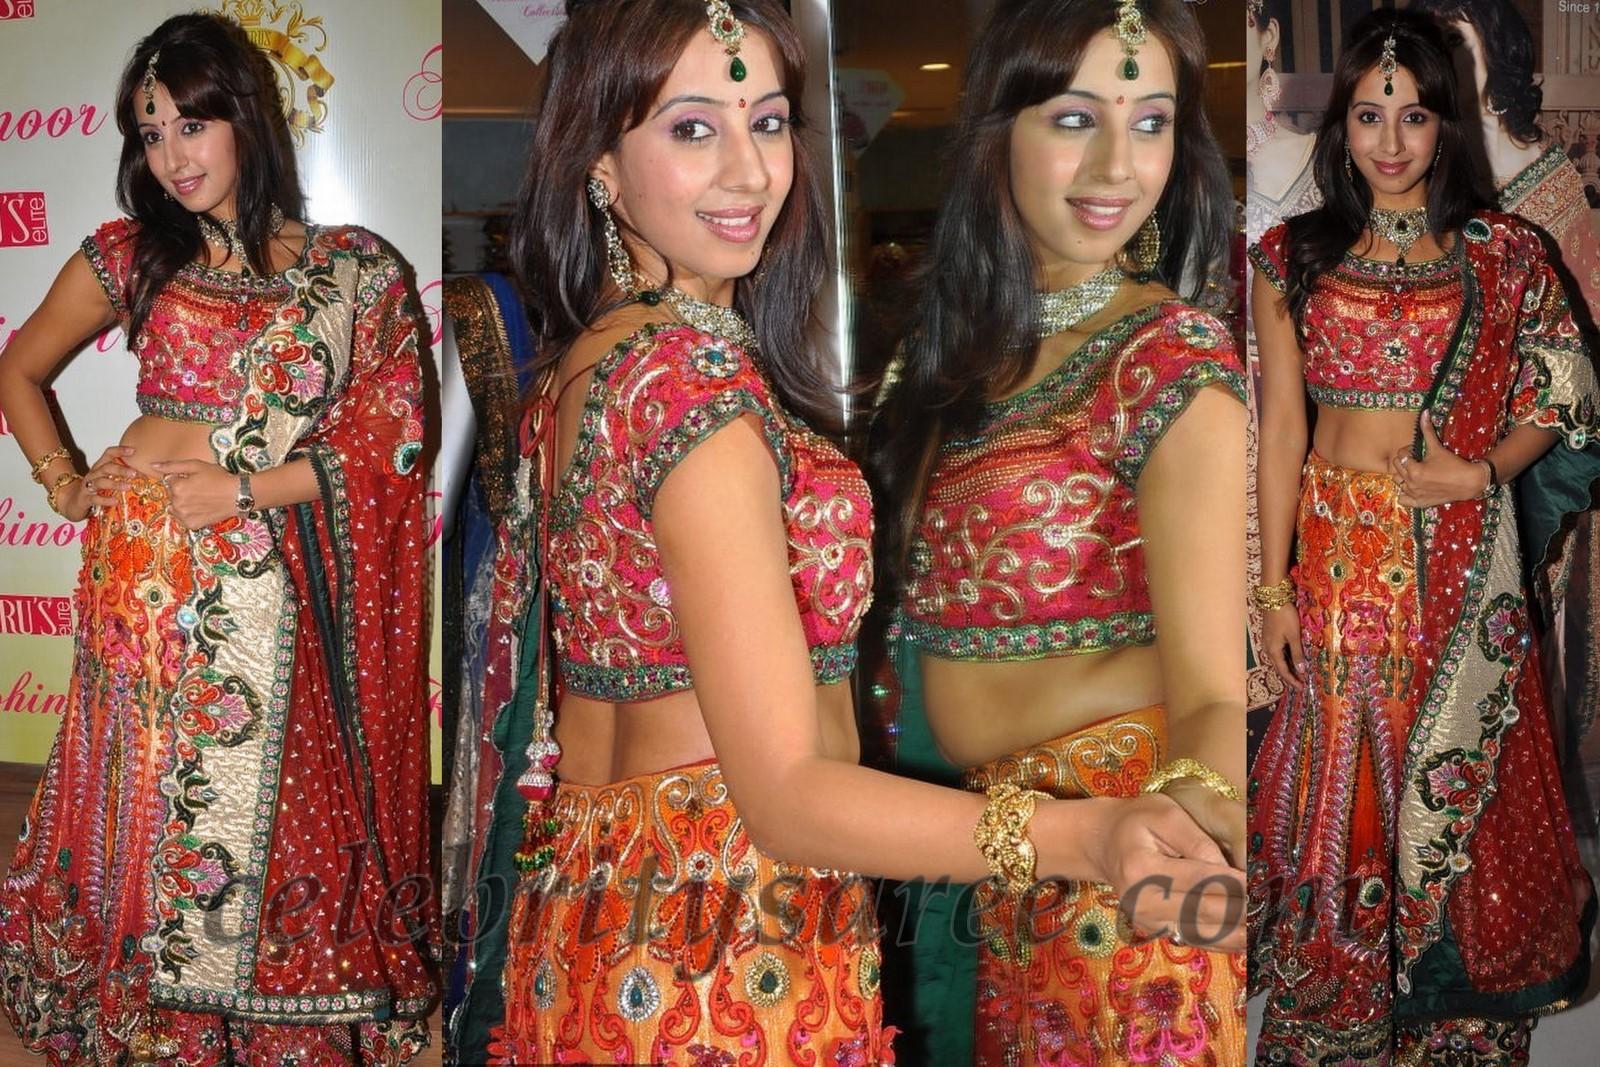 Sanjana Singh in Neerus Bridal Lehenga - Saree Blouse Patterns